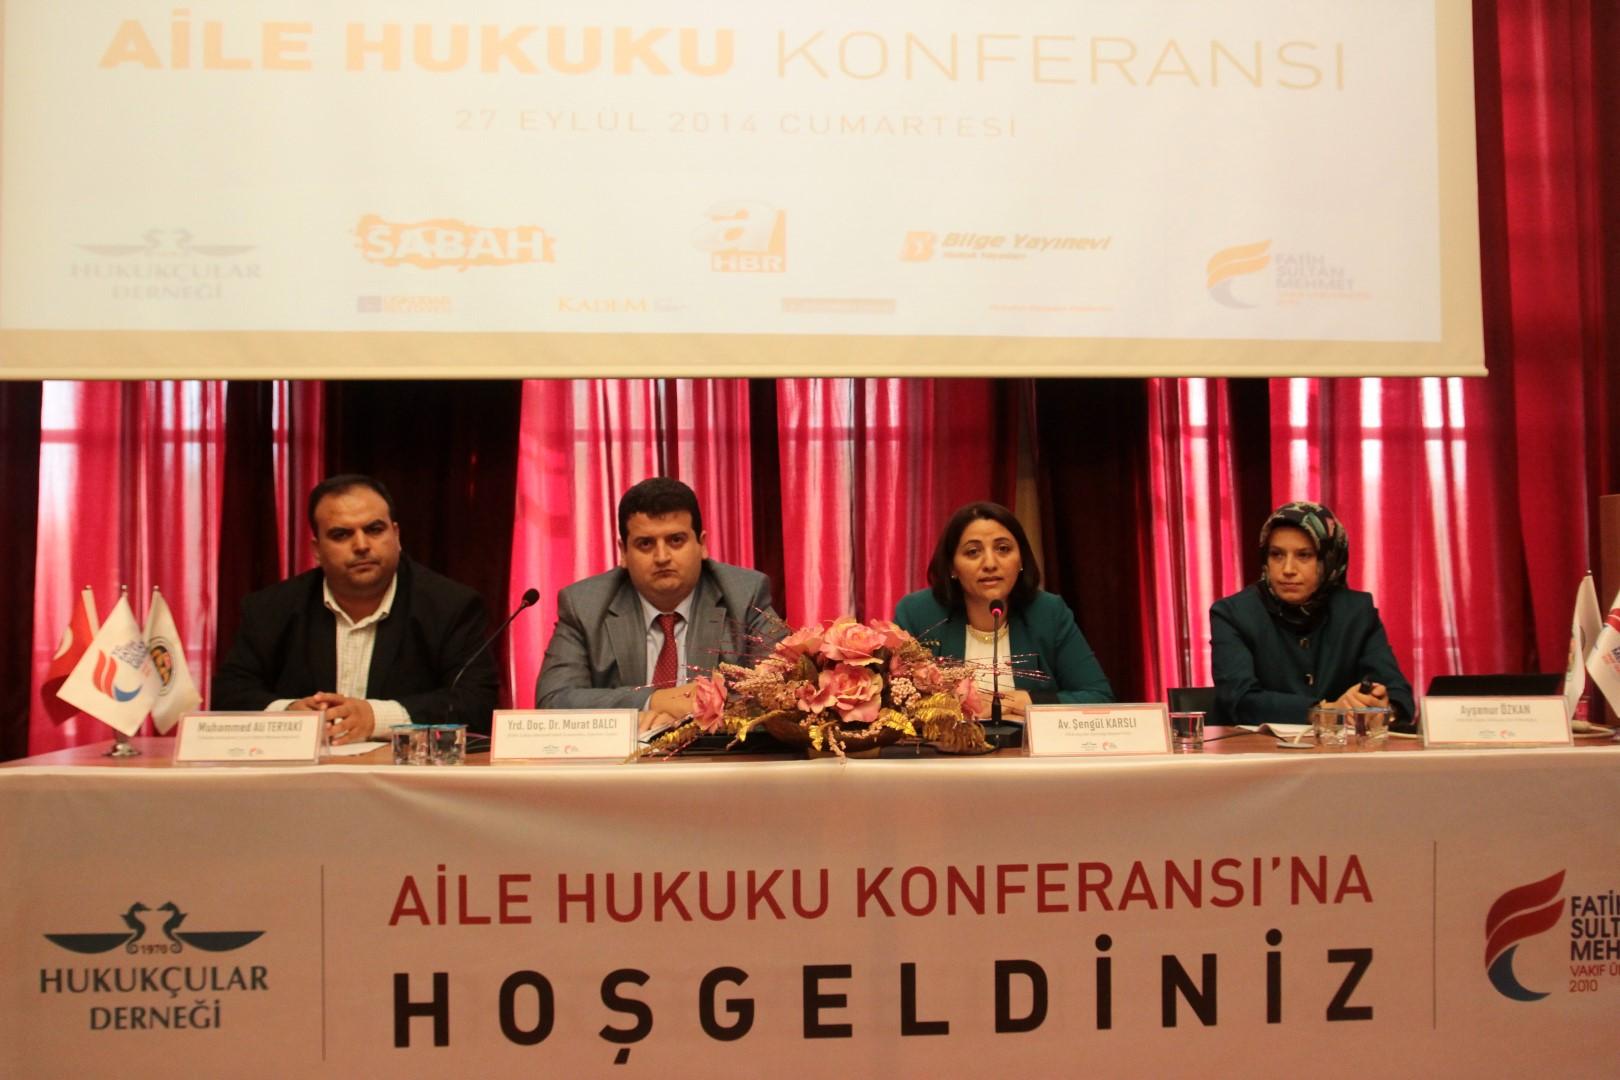 http://hukuk.fatihsultan.edu.tr/resimler/upload/Aile-Hukuku-Konferansi-Yapildi-8300914.jpg